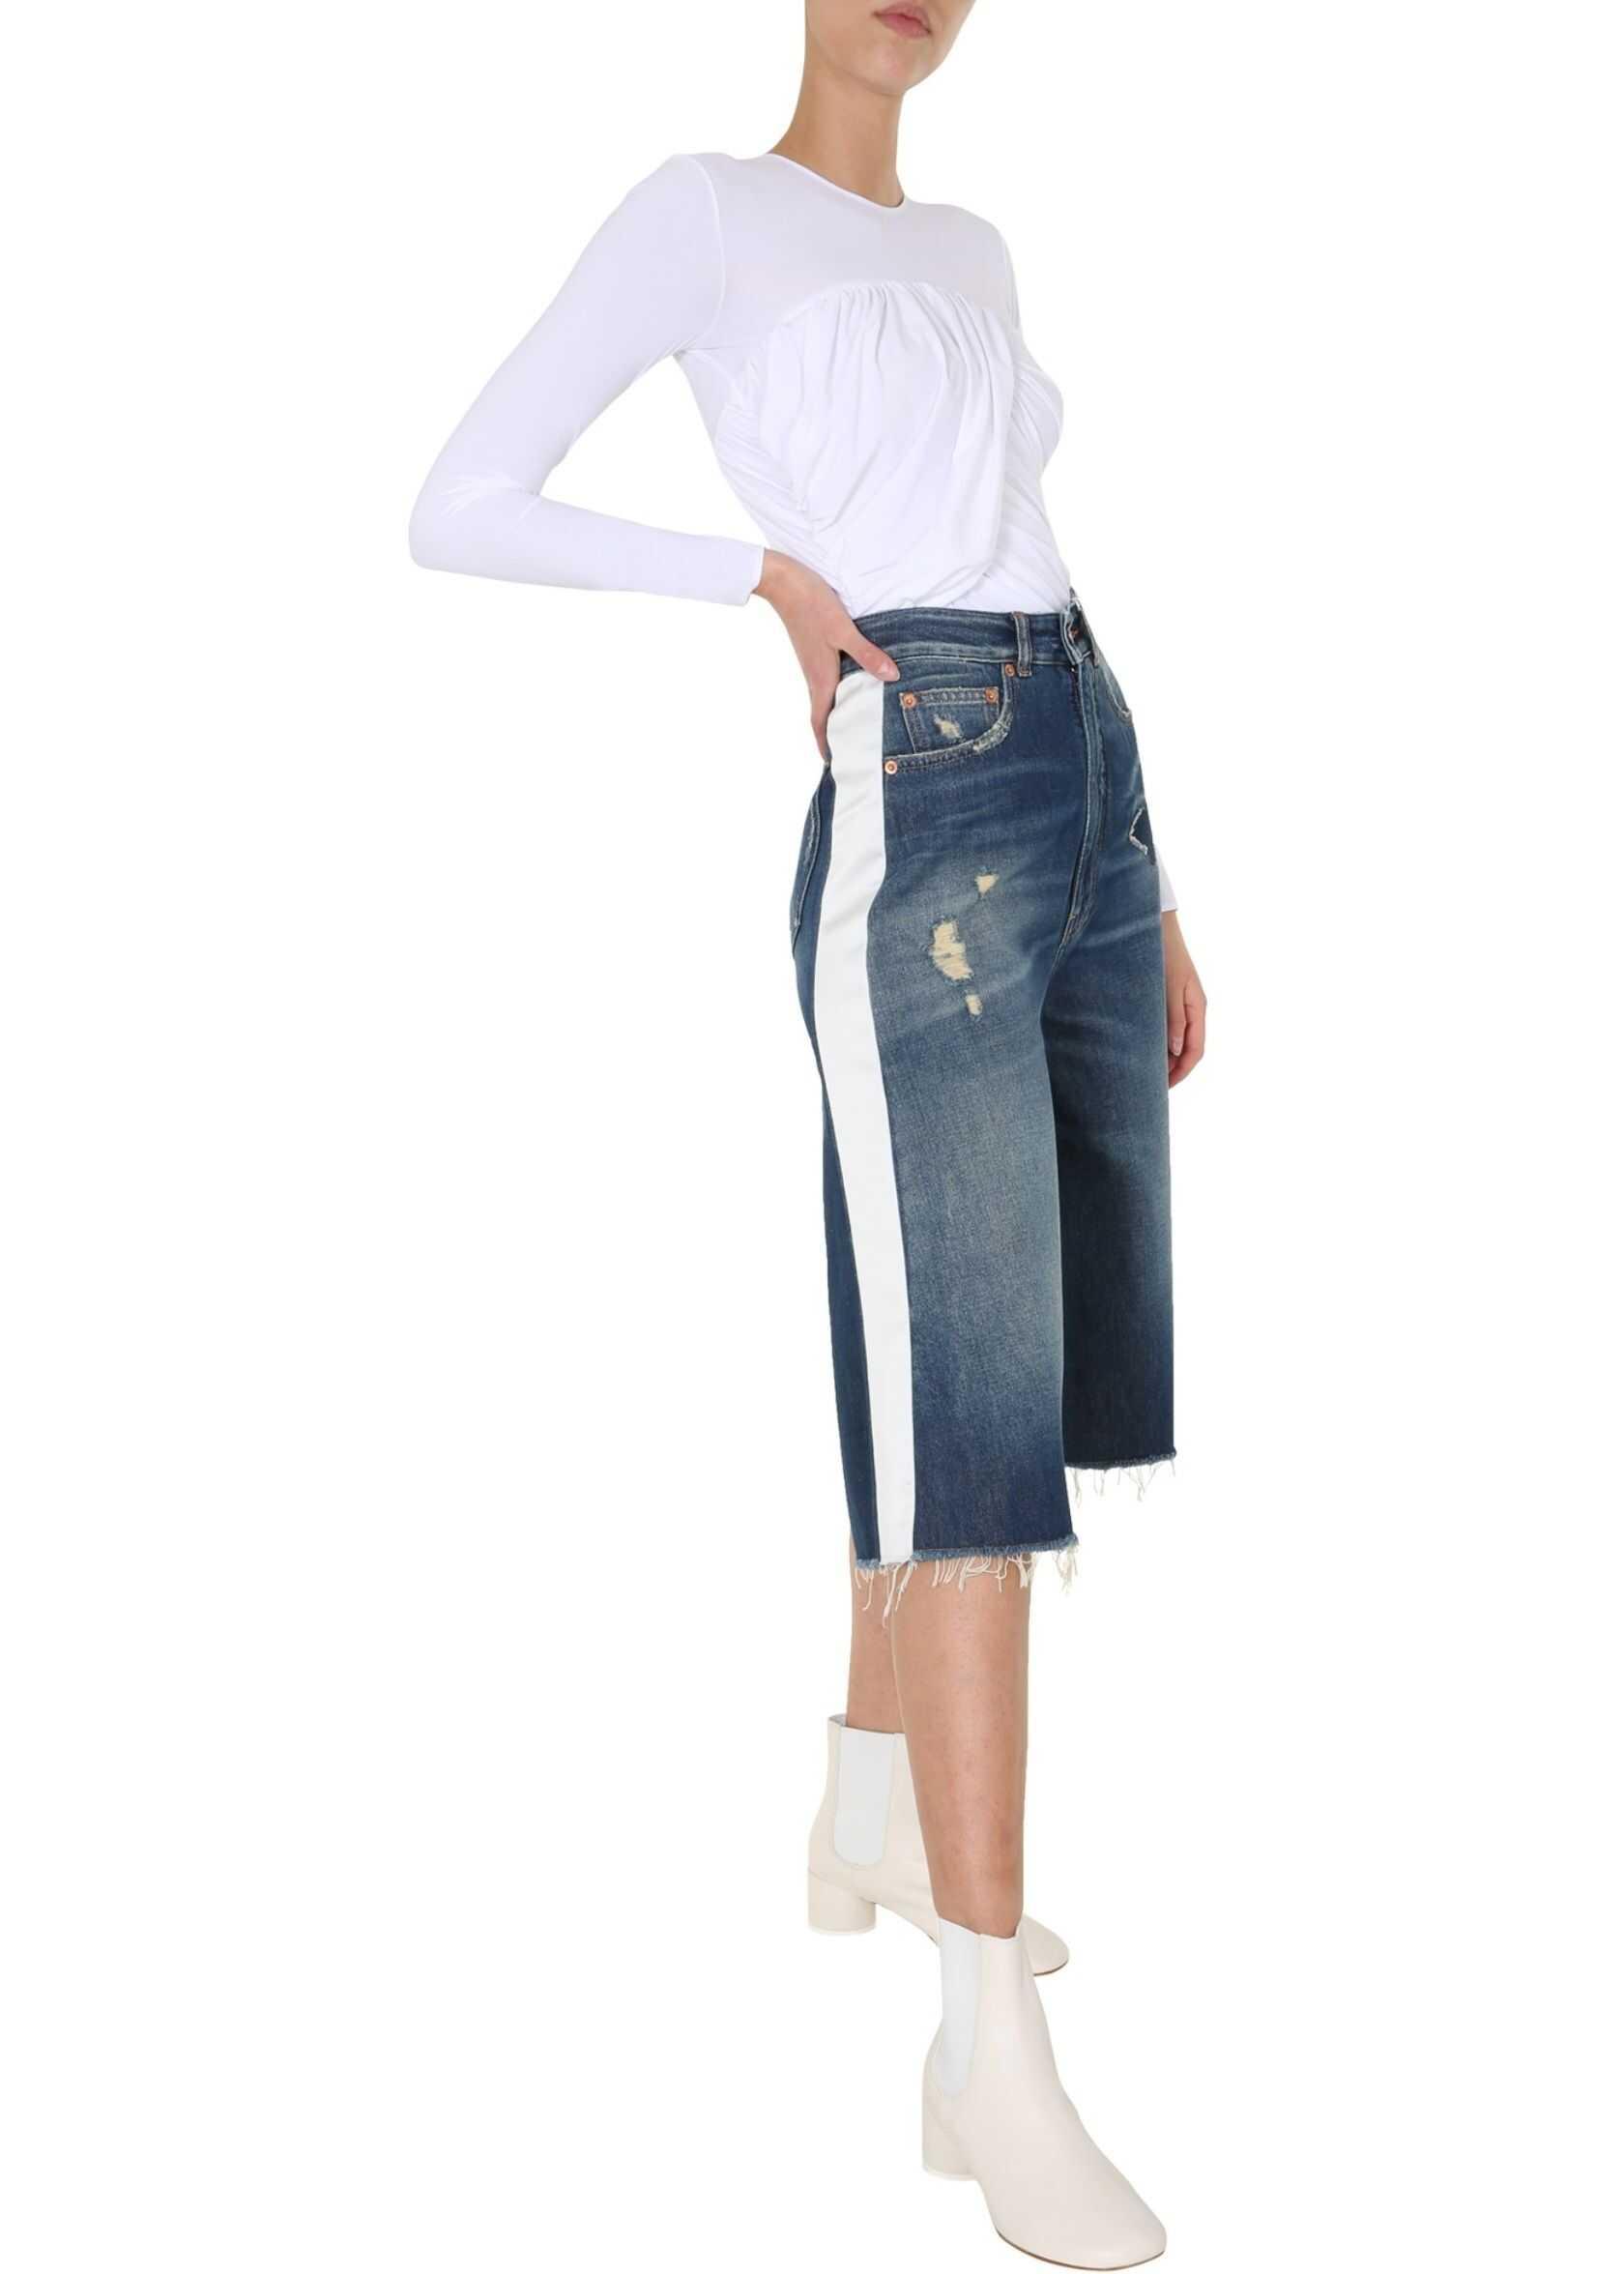 MM6 Maison Margiela Long Sleeved Bodycon* WHITE